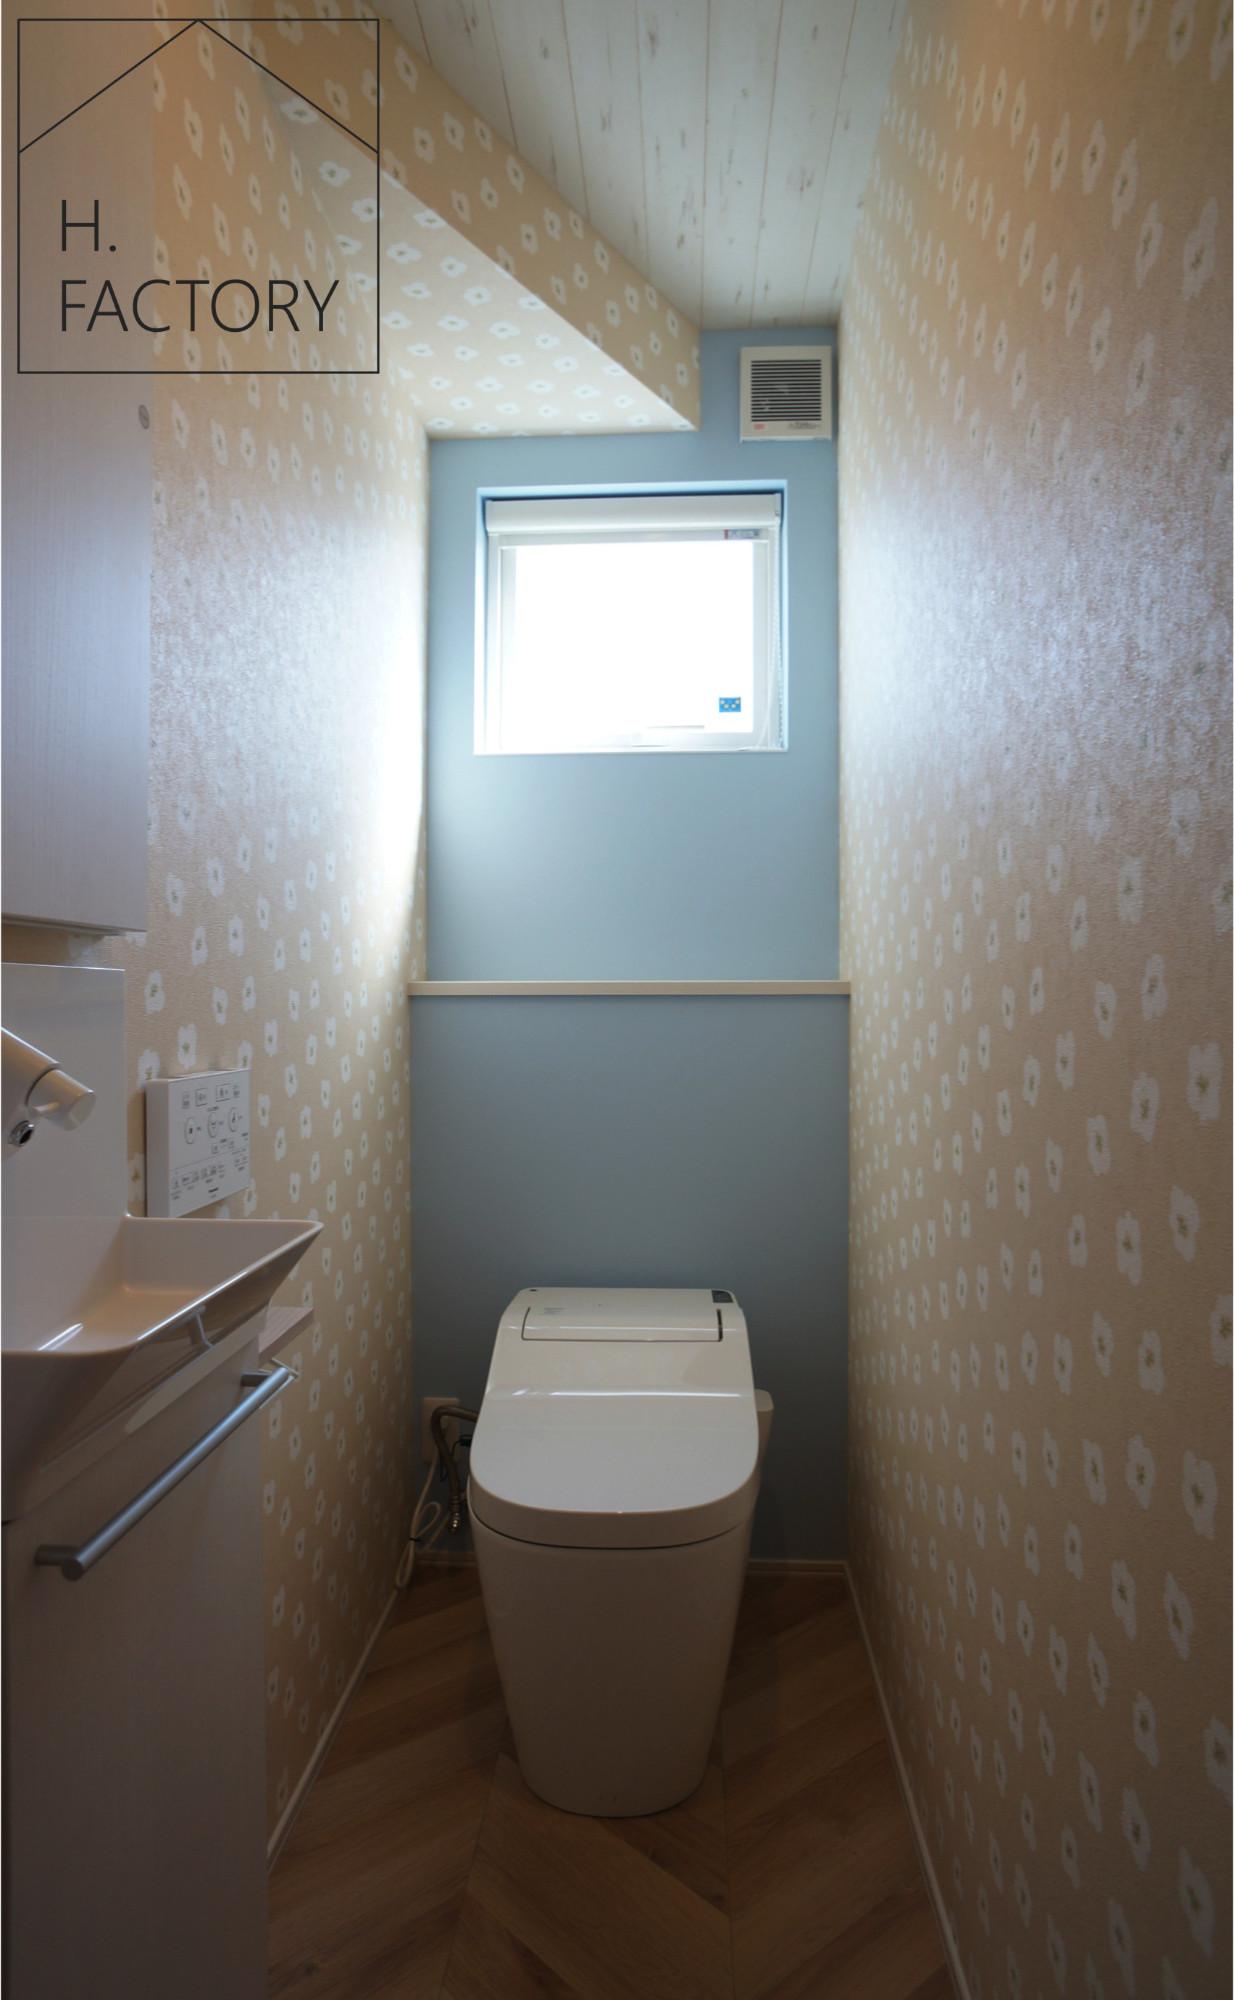 H.FACTORY/株式会社 橋本技建「深呼吸をしたくなる北欧の家」の実例写真